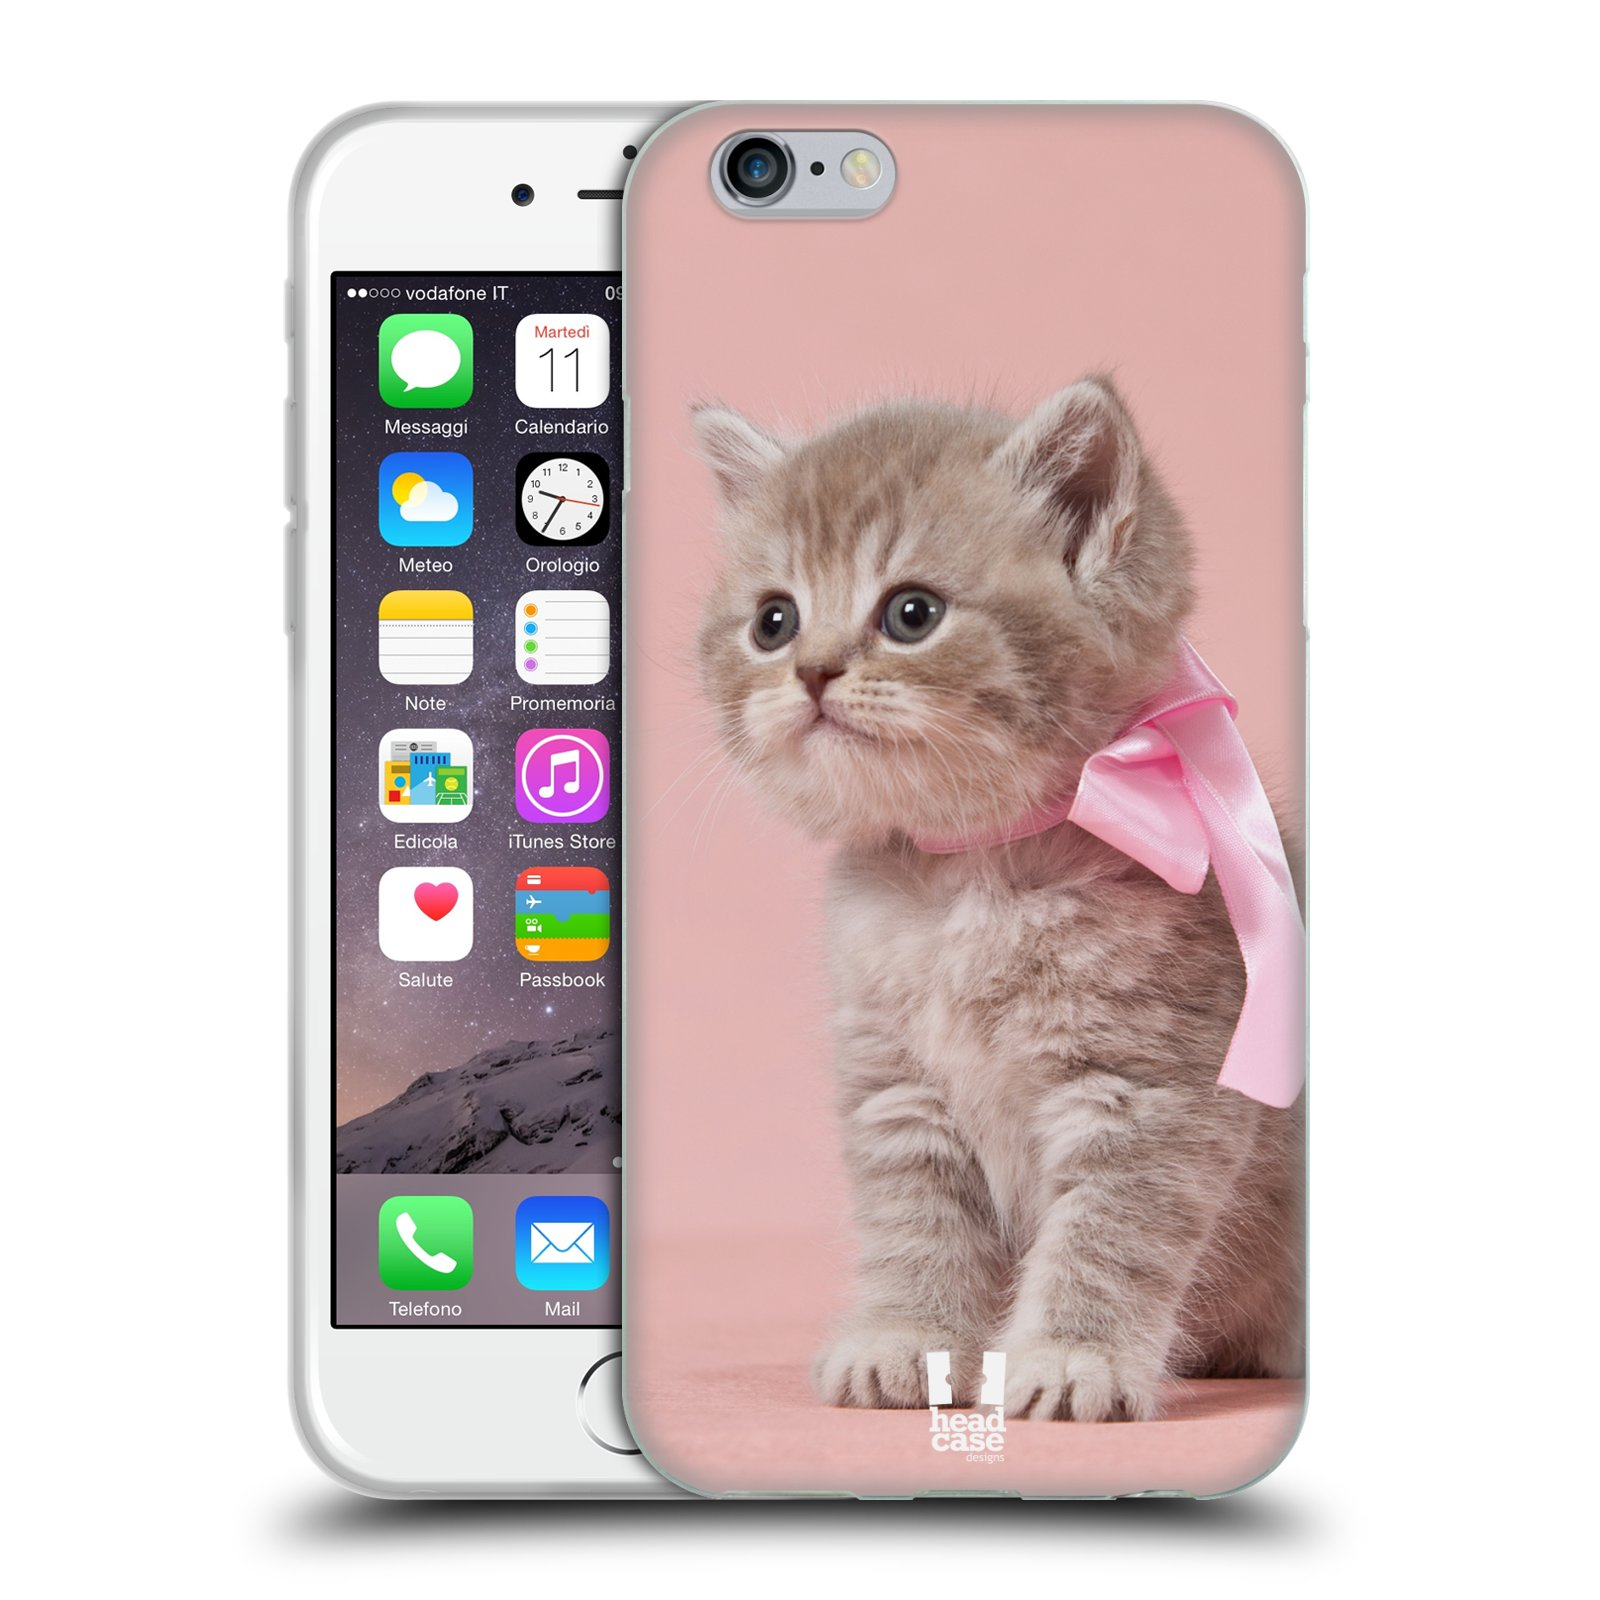 HEAD CASE silikonový obal na mobil Apple Iphone 6/6S vzor Kočičky koťata foto kotě s růžovou mašlí